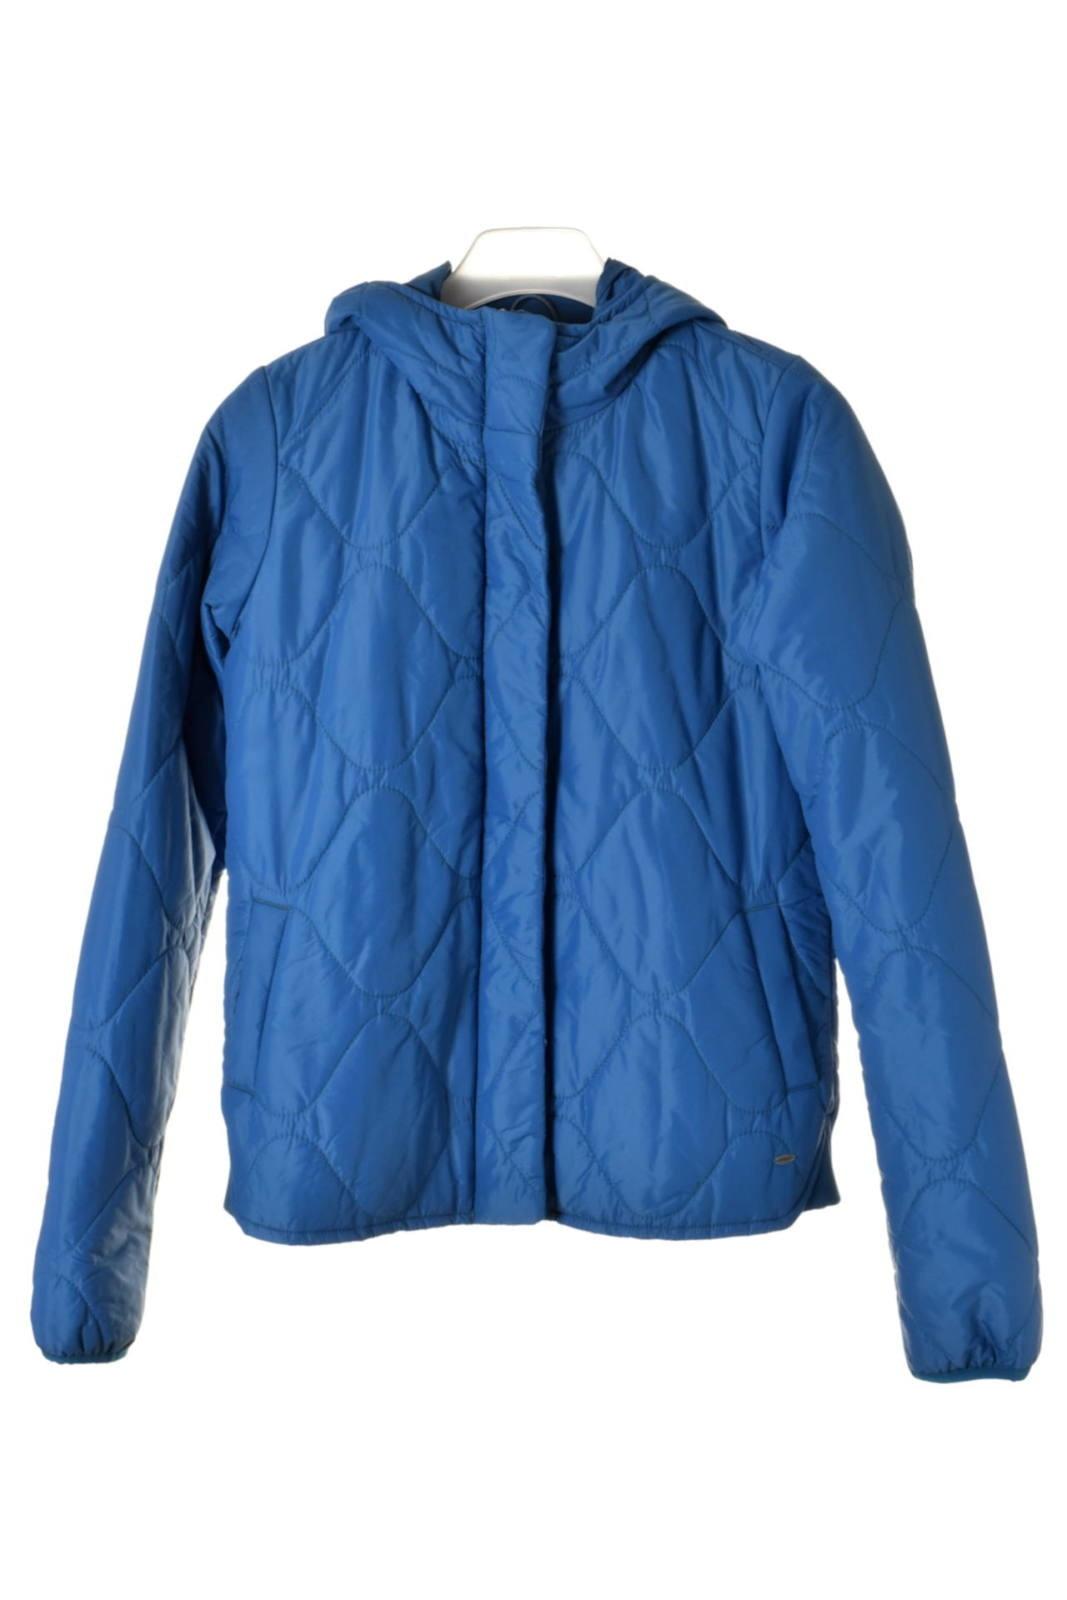 O'neill kék, kapucnis női dzseki – S